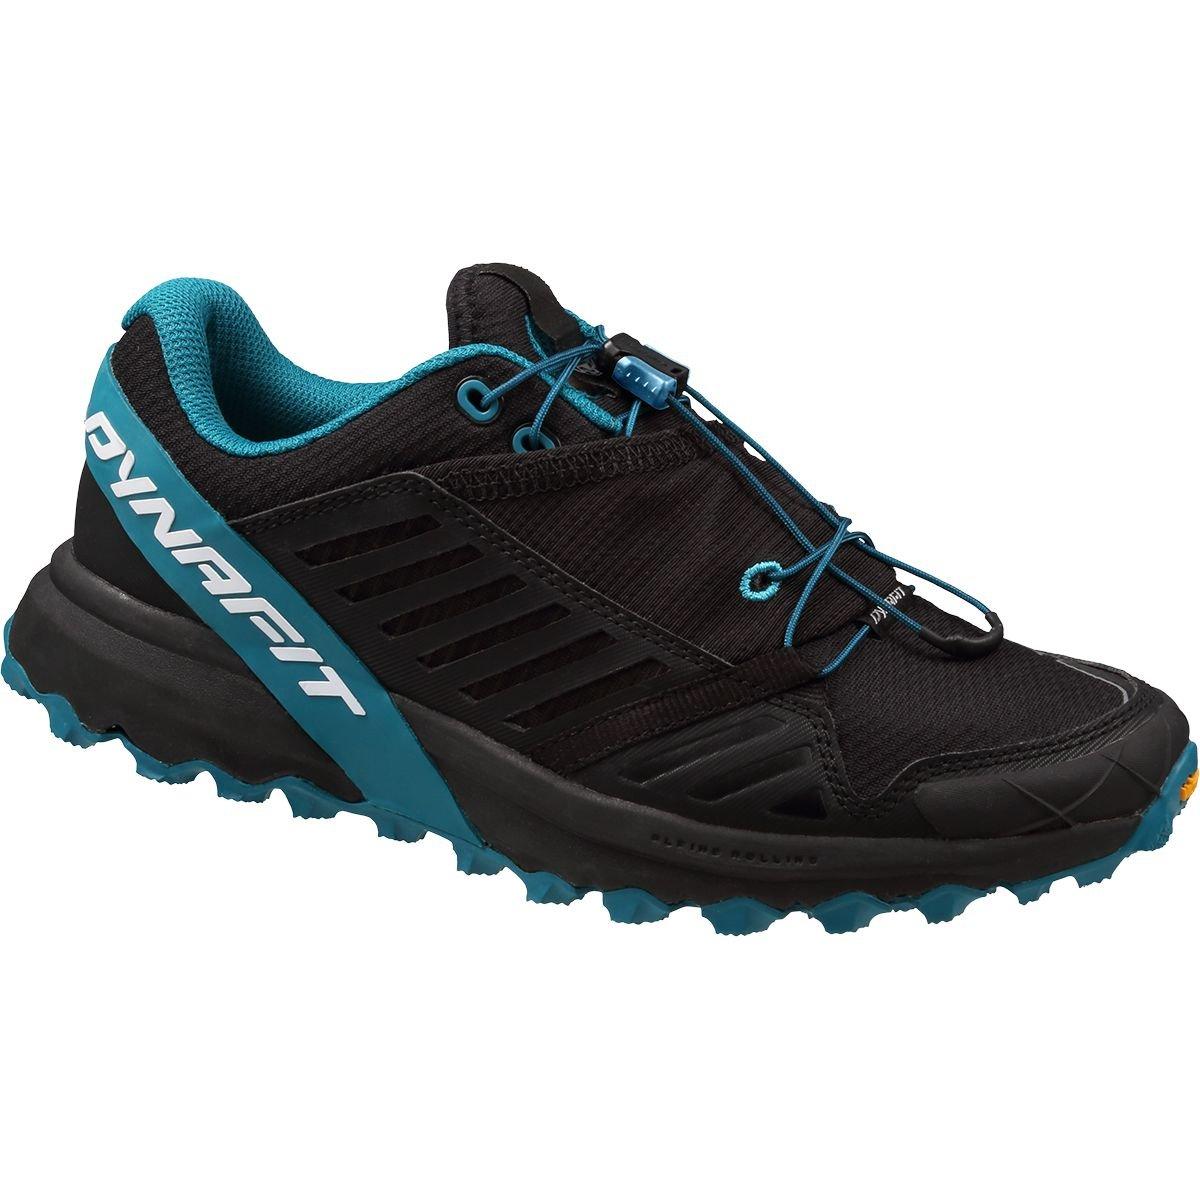 schwarz Out-malta Dynafit Damen Alpine Pro W Traillaufschuhe